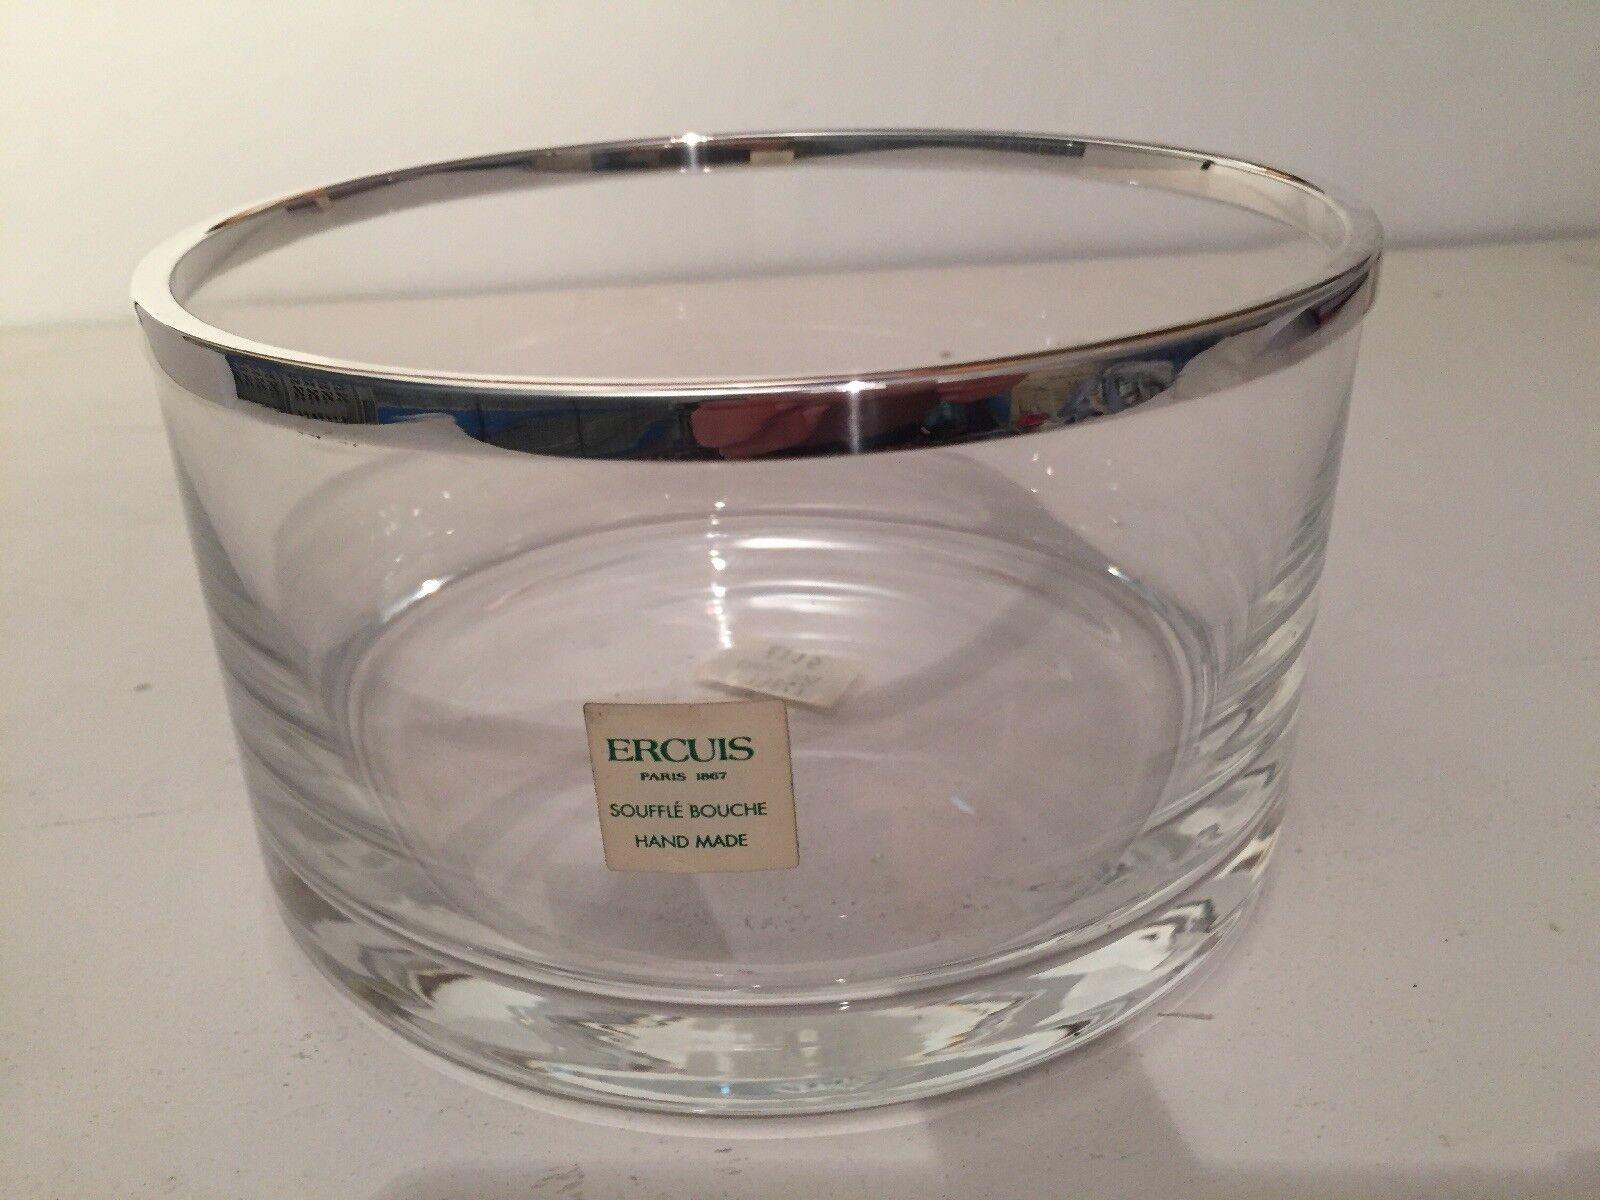 ERCUIS Paris Crystal Glass Cercle Ciotola